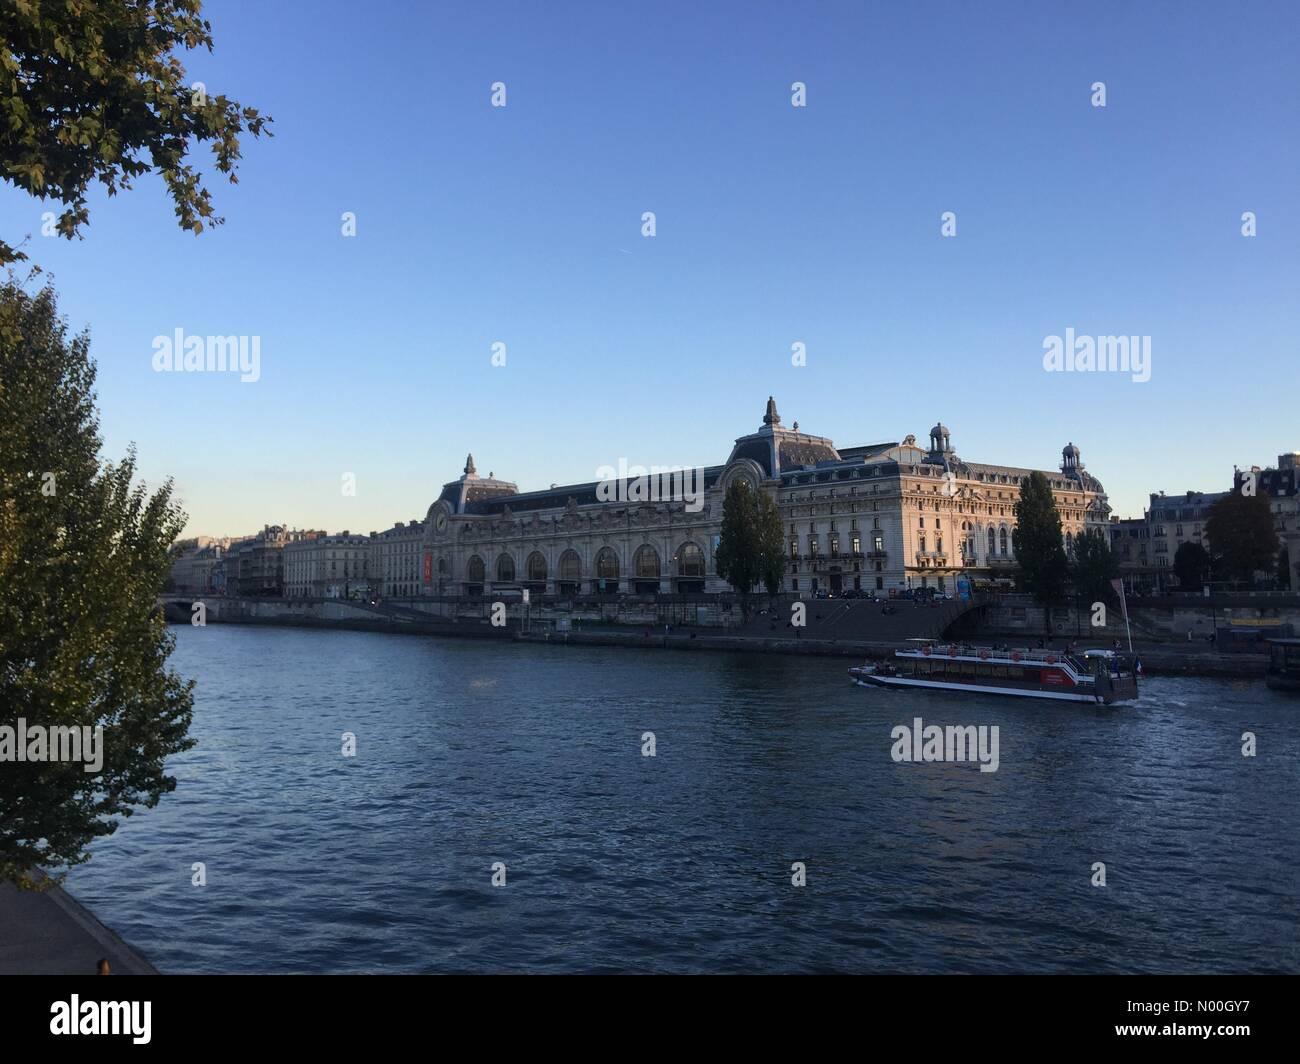 75001 Paris, France. 22nd Sep, 2017. Seine river, Paris Credit: InesAmd/StockimoNews/Alamy Live News - Stock Image